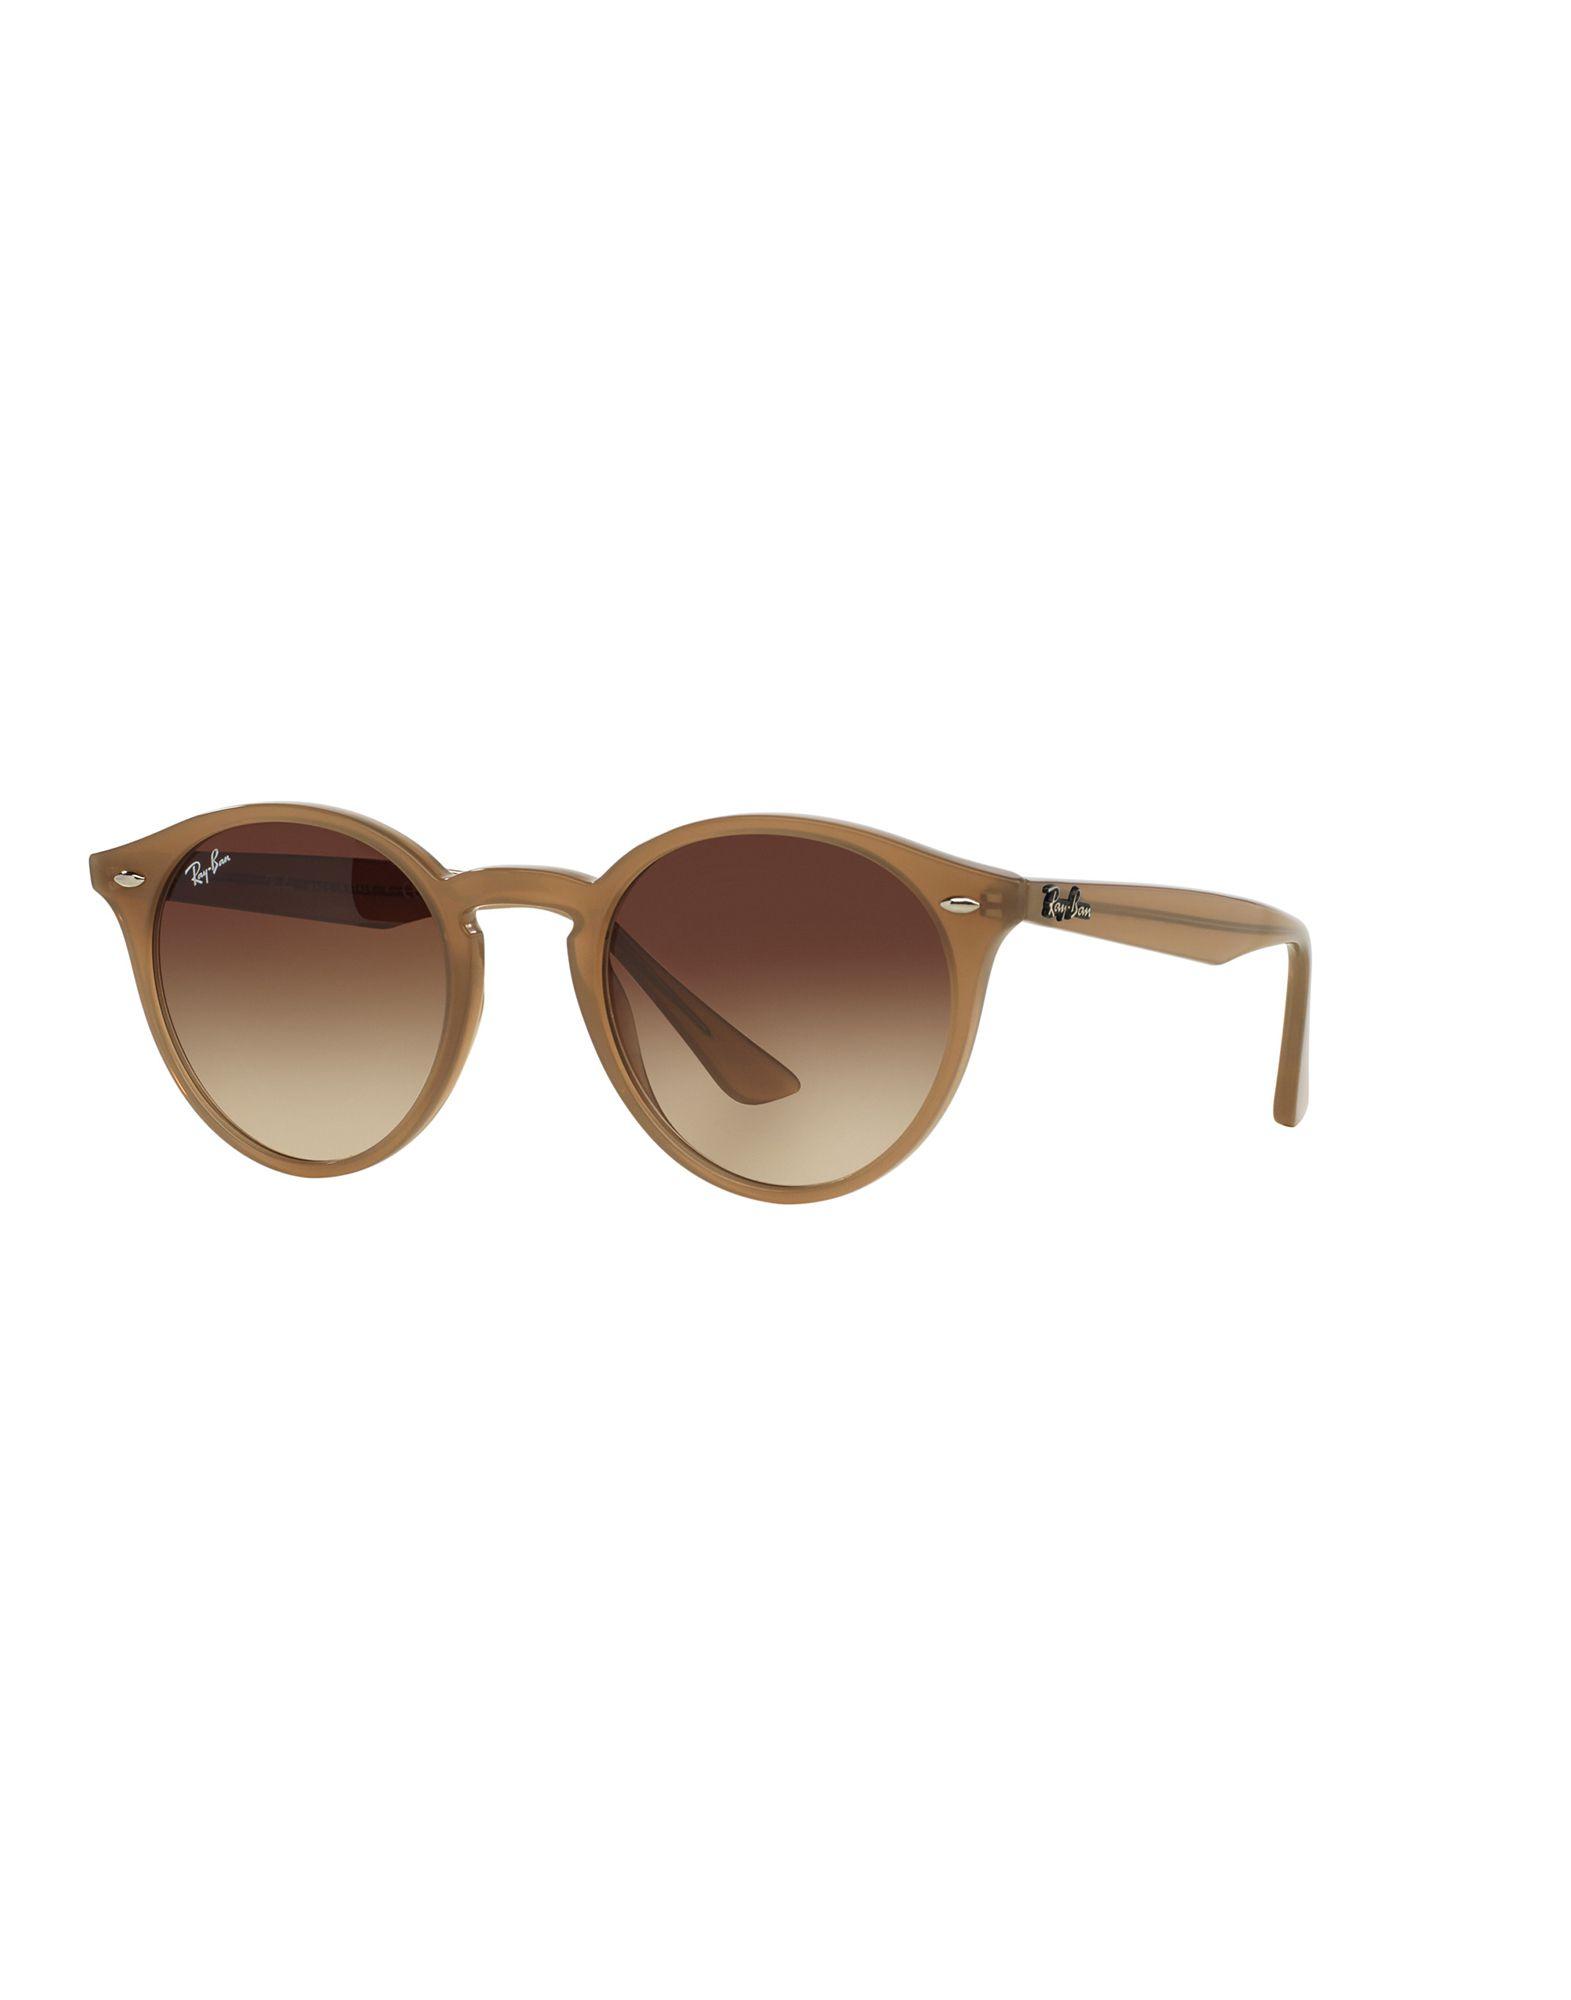 RAY-BAN Солнечные очки солнцезащитные очки ray ban rayban ray ban rb3387 001 13 004 13